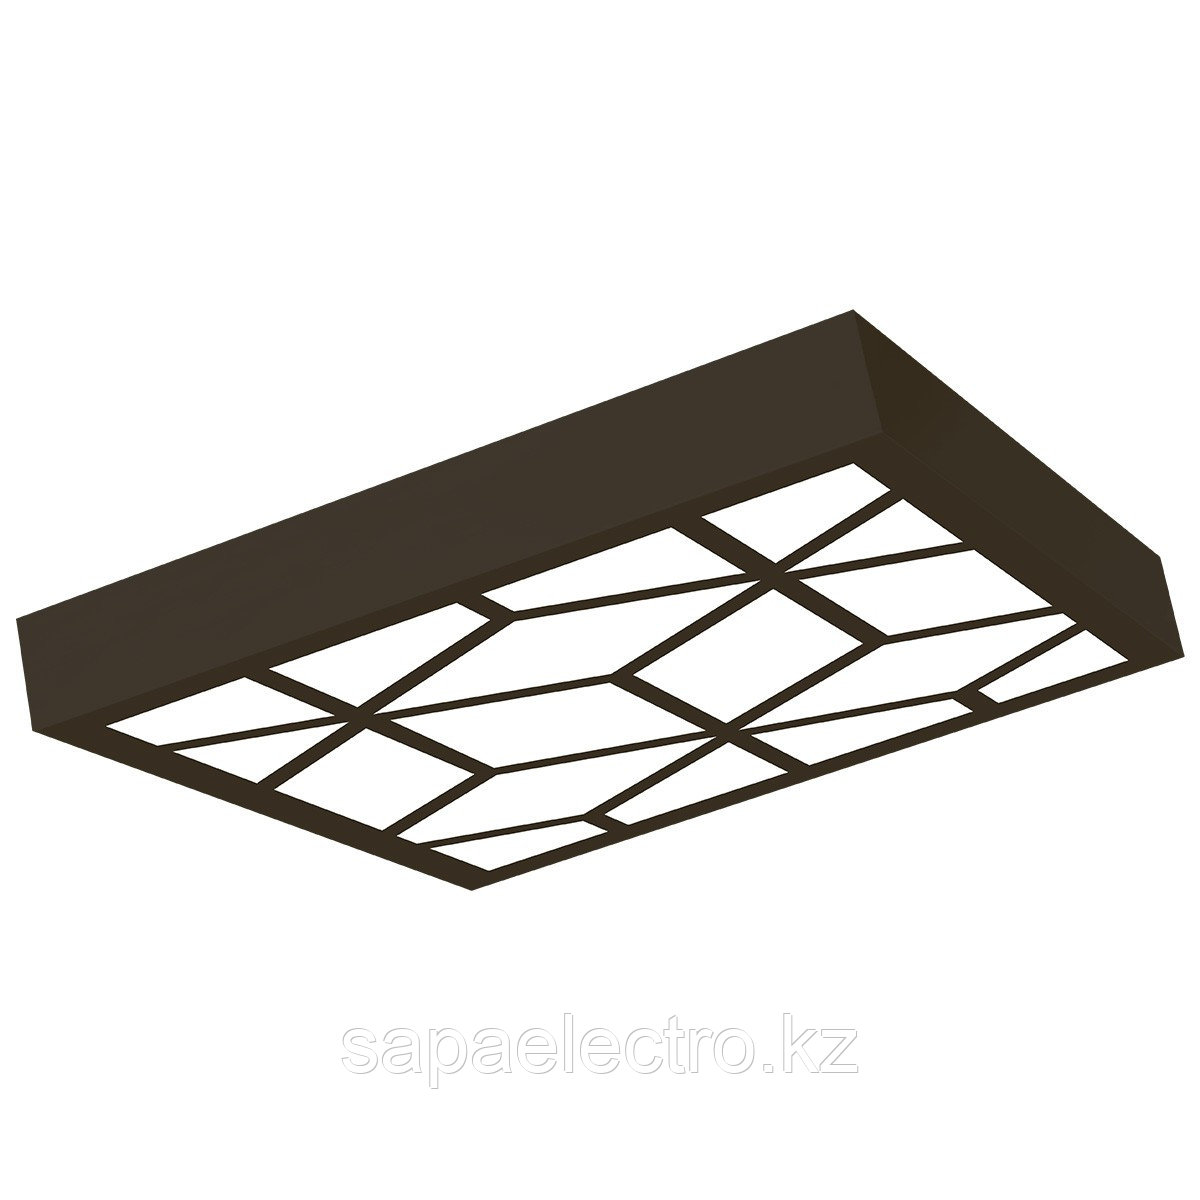 Св-к  OPALLED VITRAGE 48W BLACK S/U  600x600 5700K